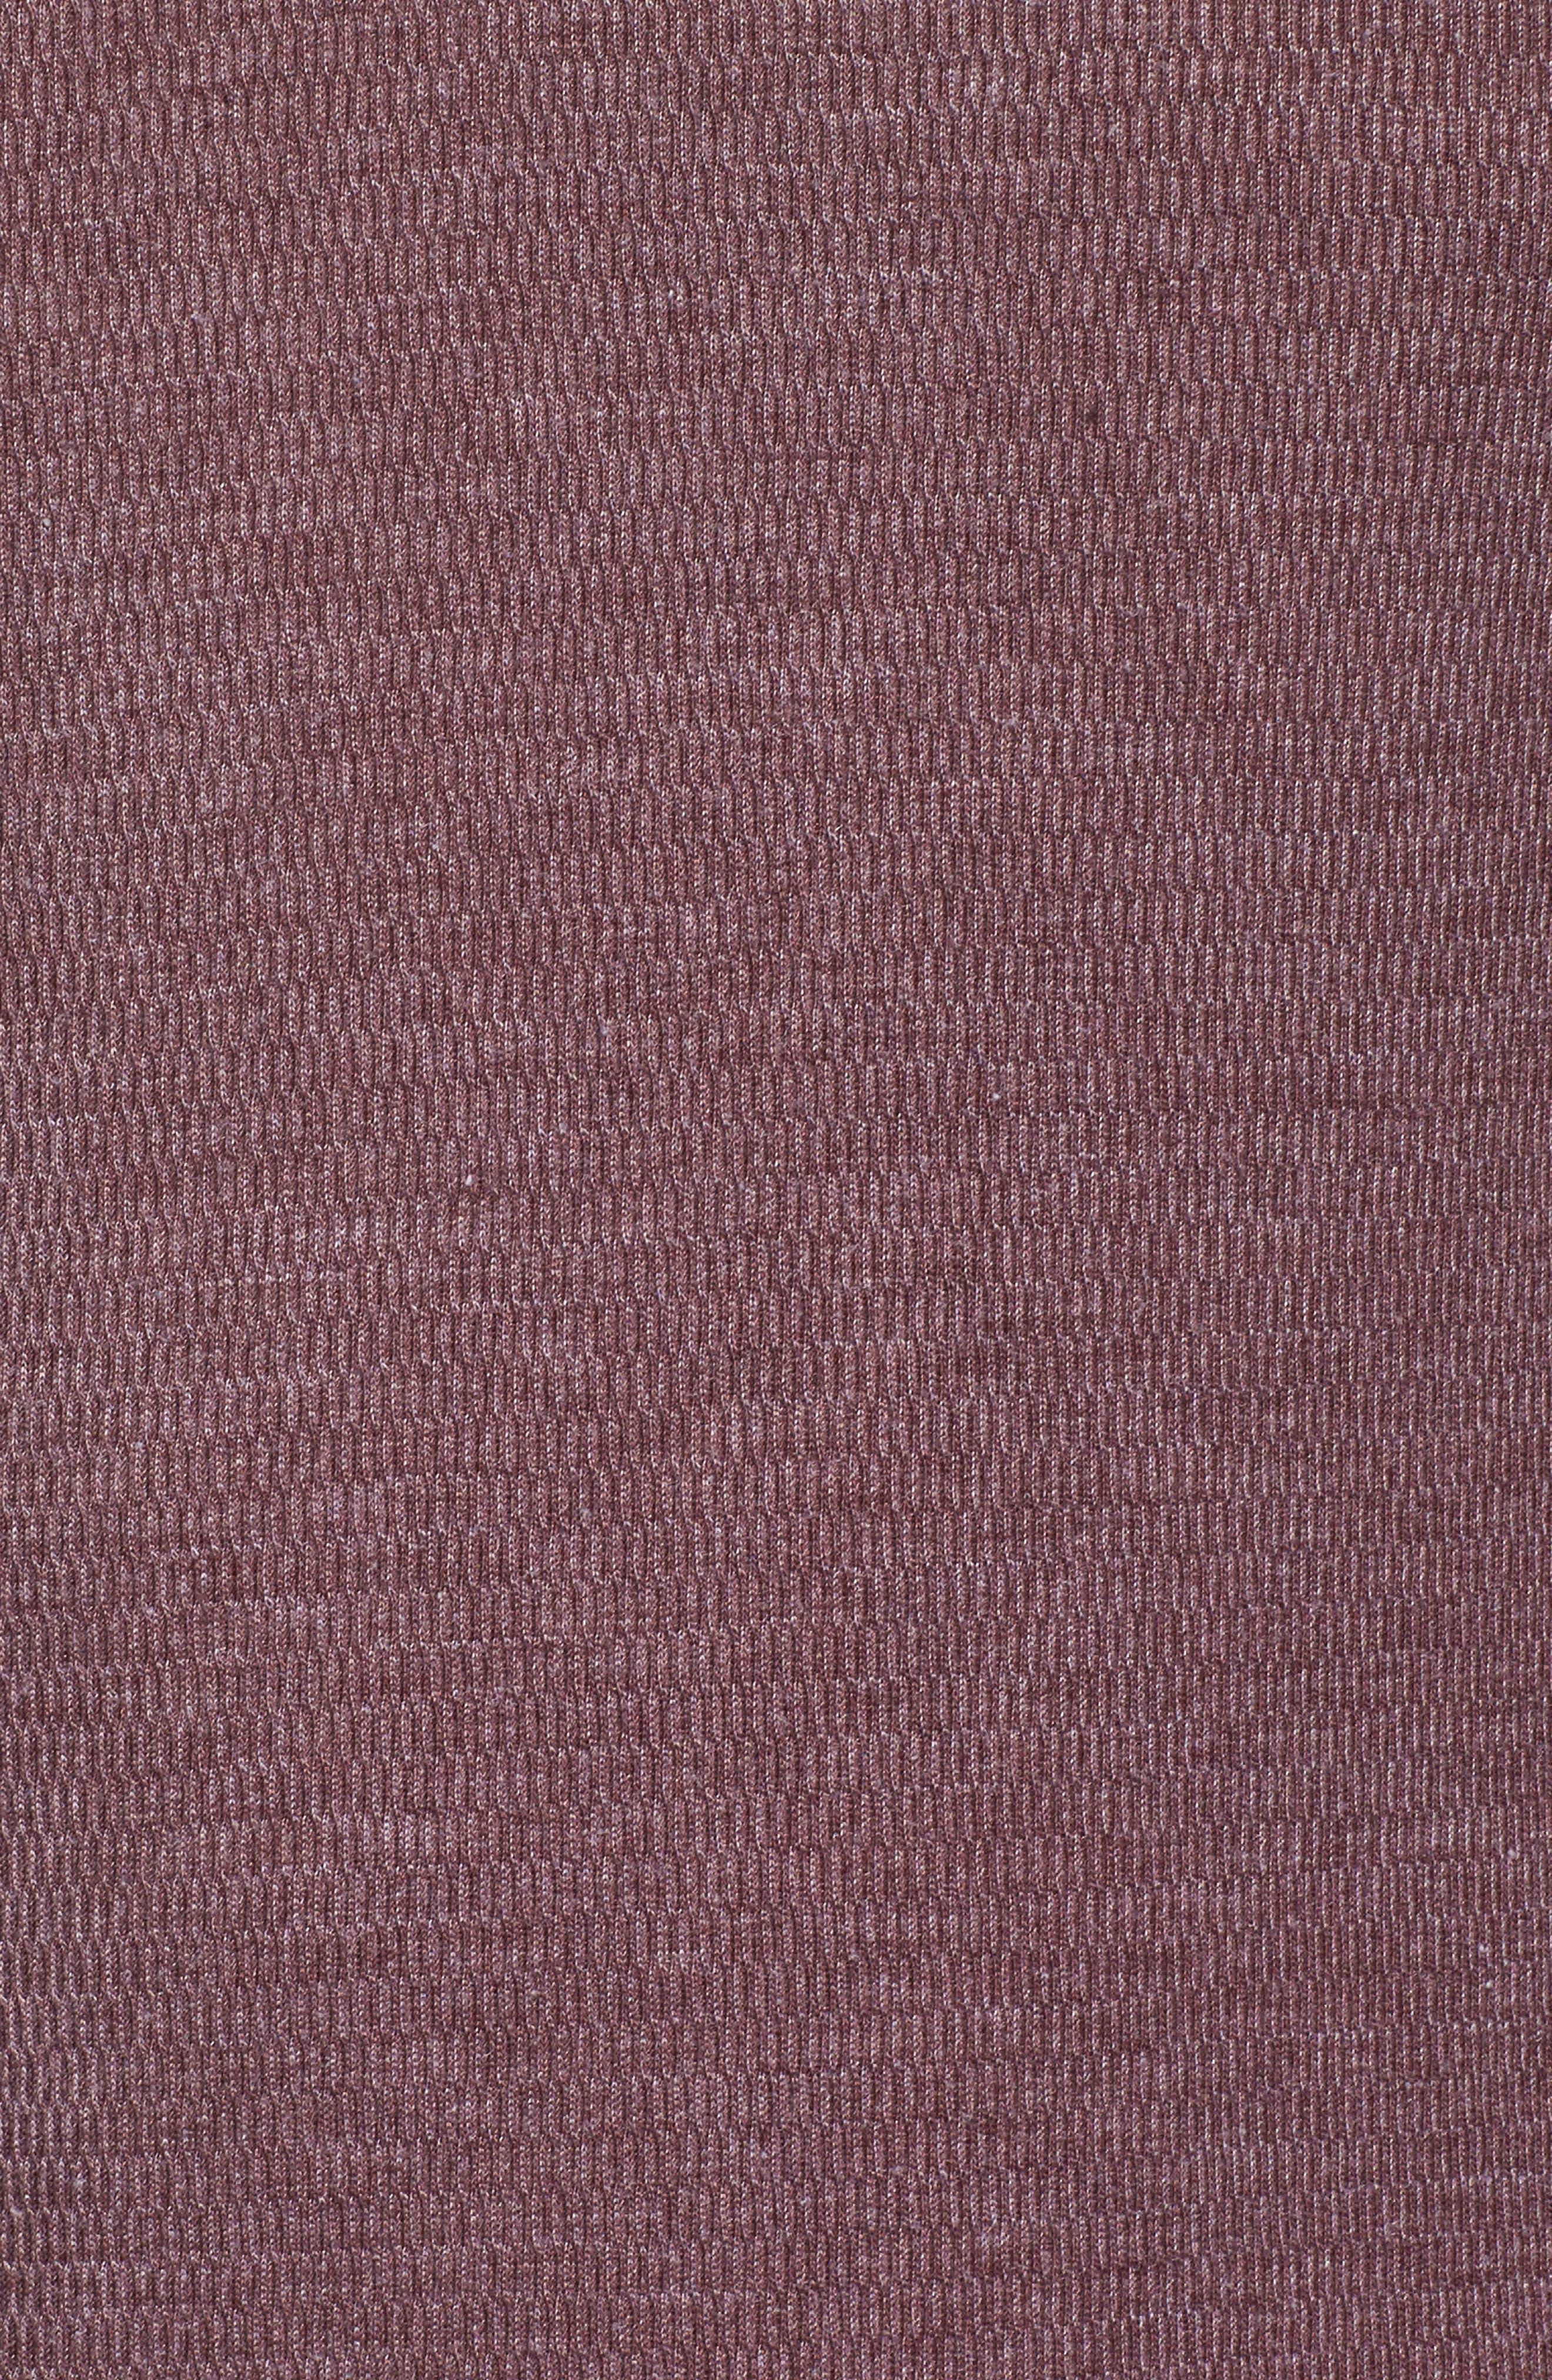 Notch Neck Thermal T-Shirt,                             Alternate thumbnail 35, color,